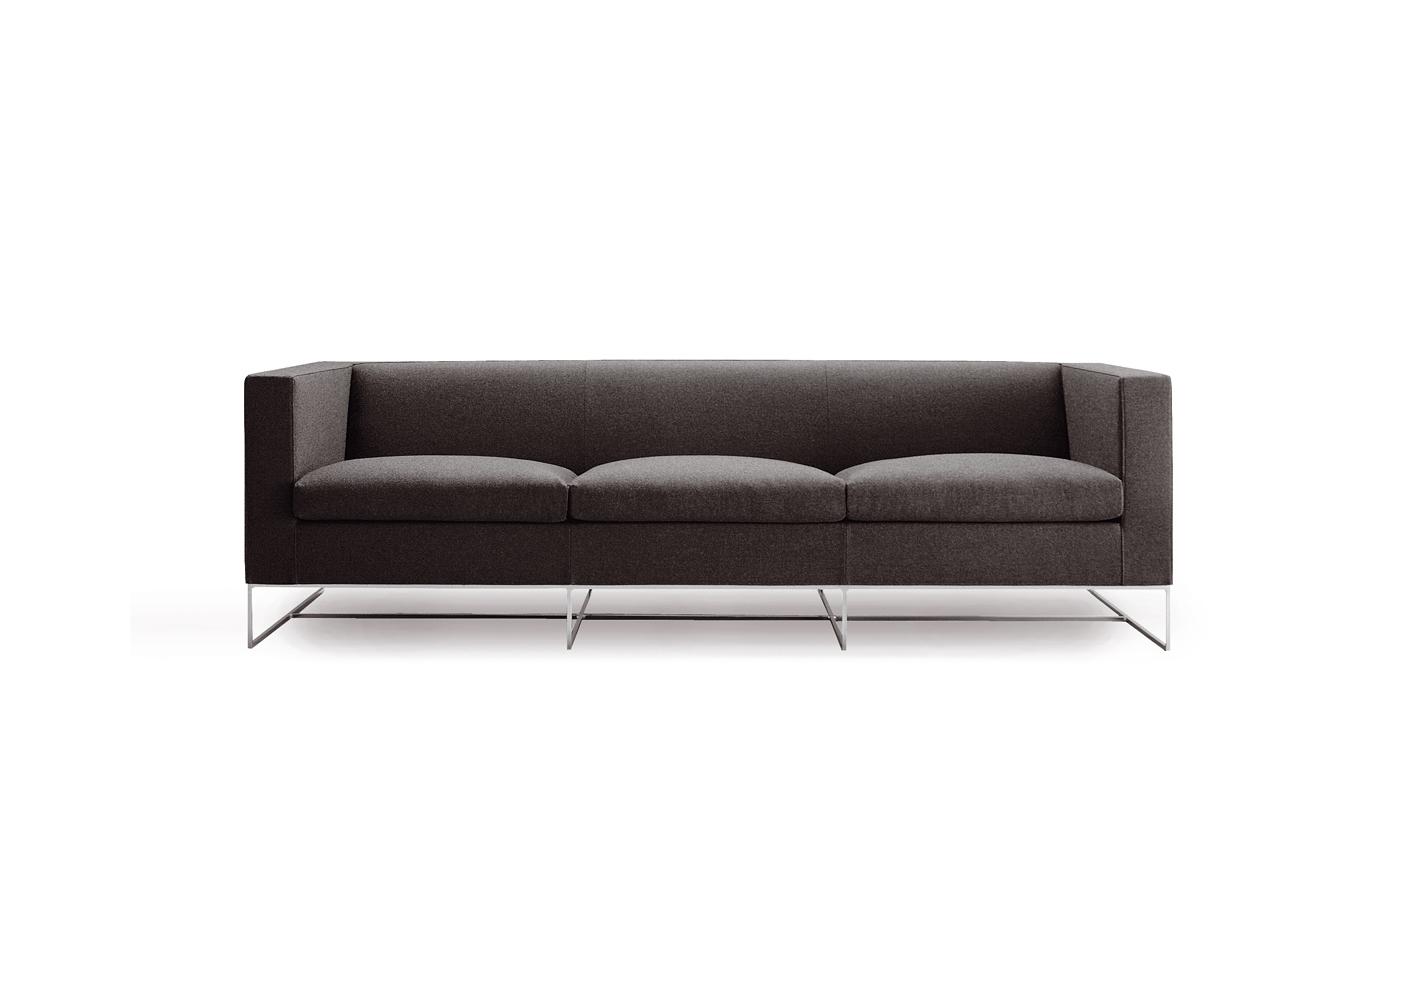 Klee sofa